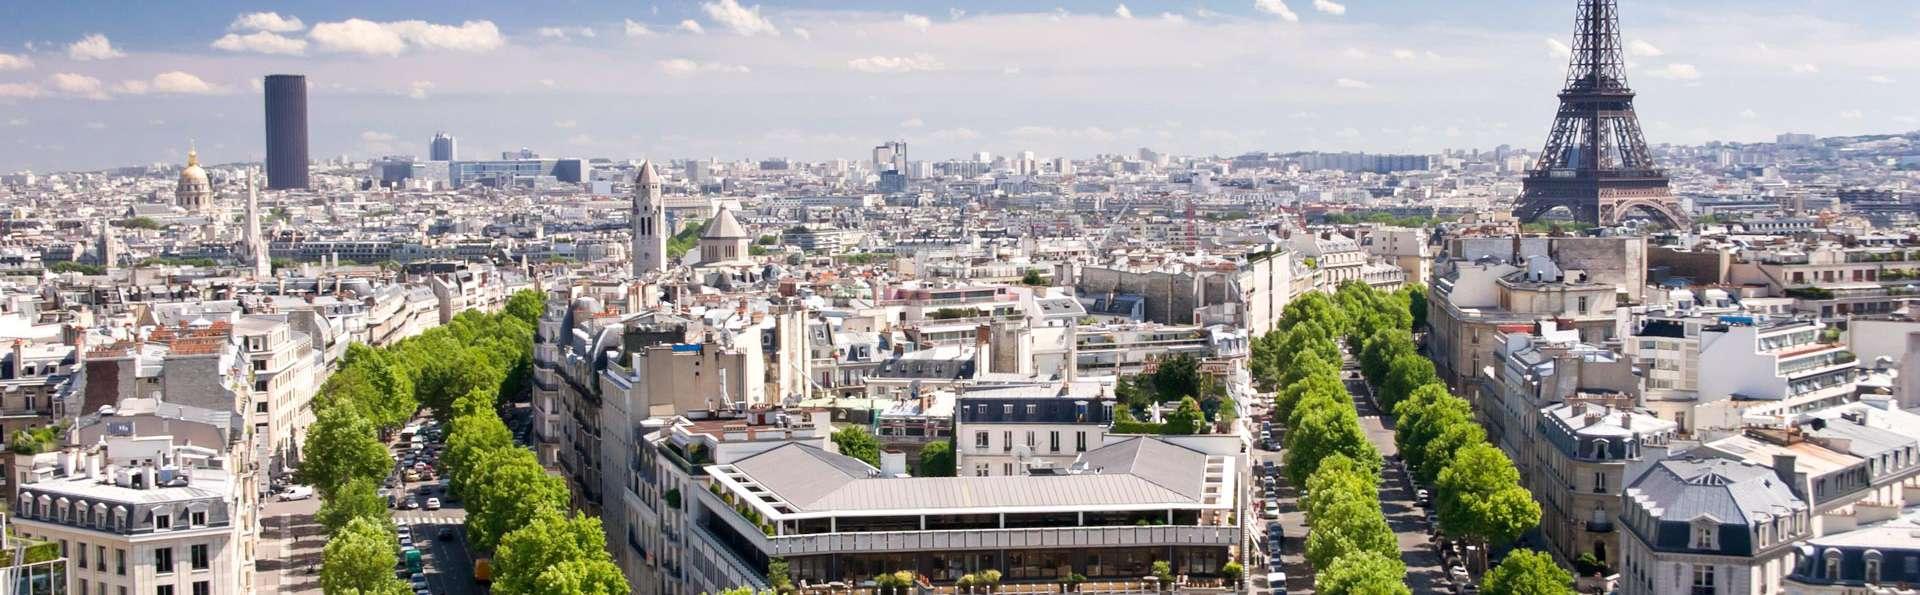 Hôtel Galileo - EDIT_PARIS_01.jpg